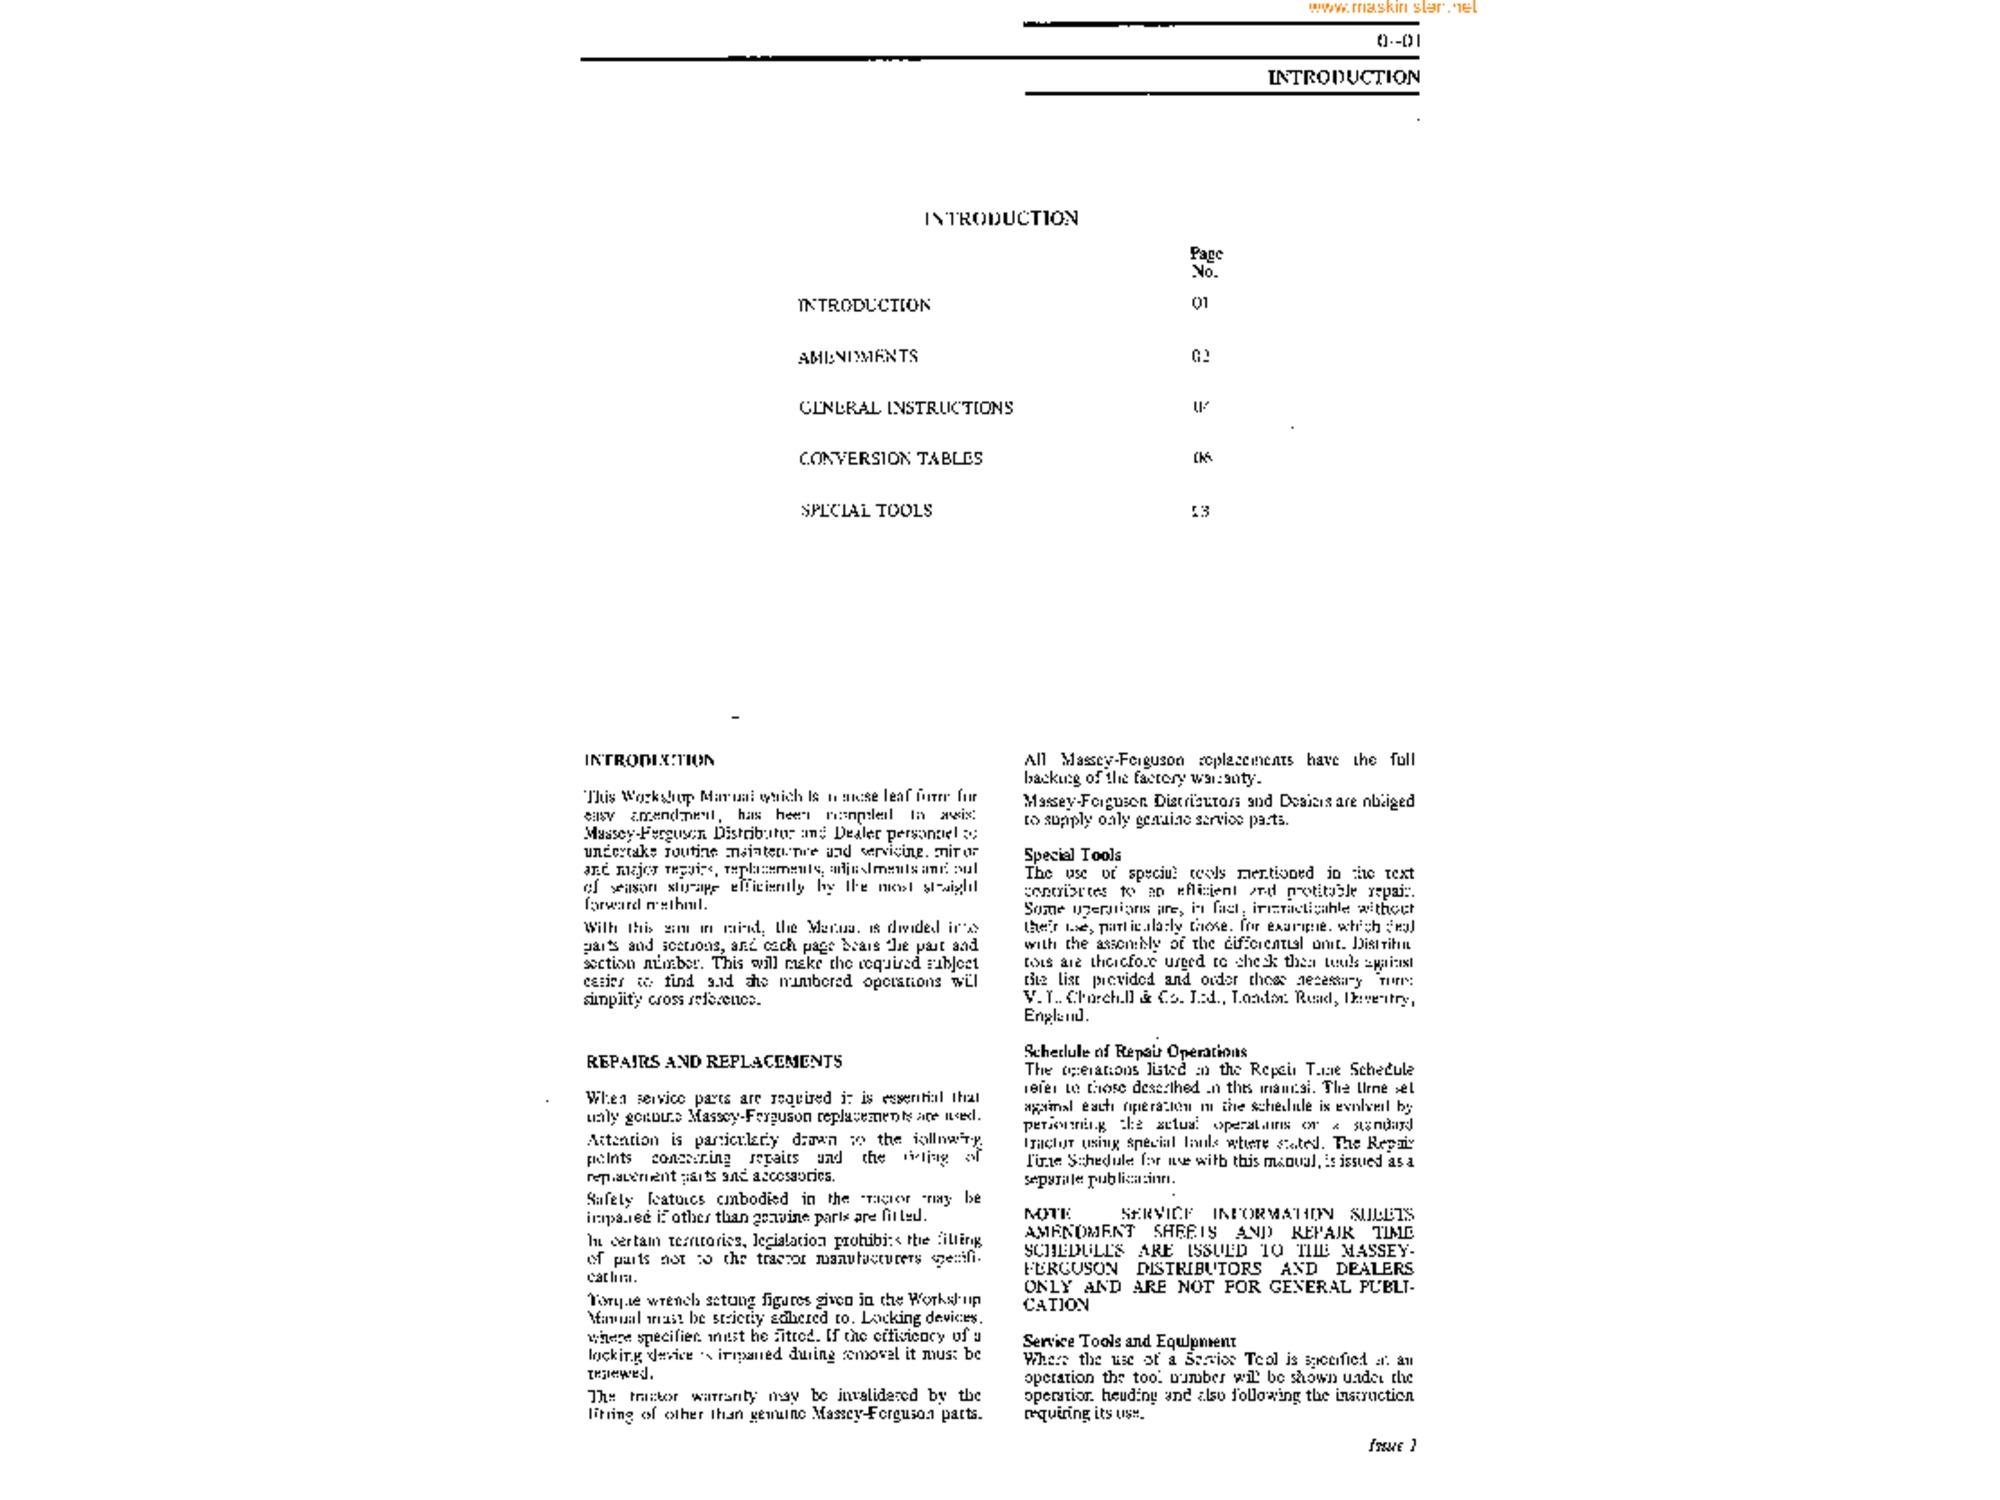 ... workshop Array - mf 135 manual download ebook rh mf 135 manual download  ebook zettadata solutions